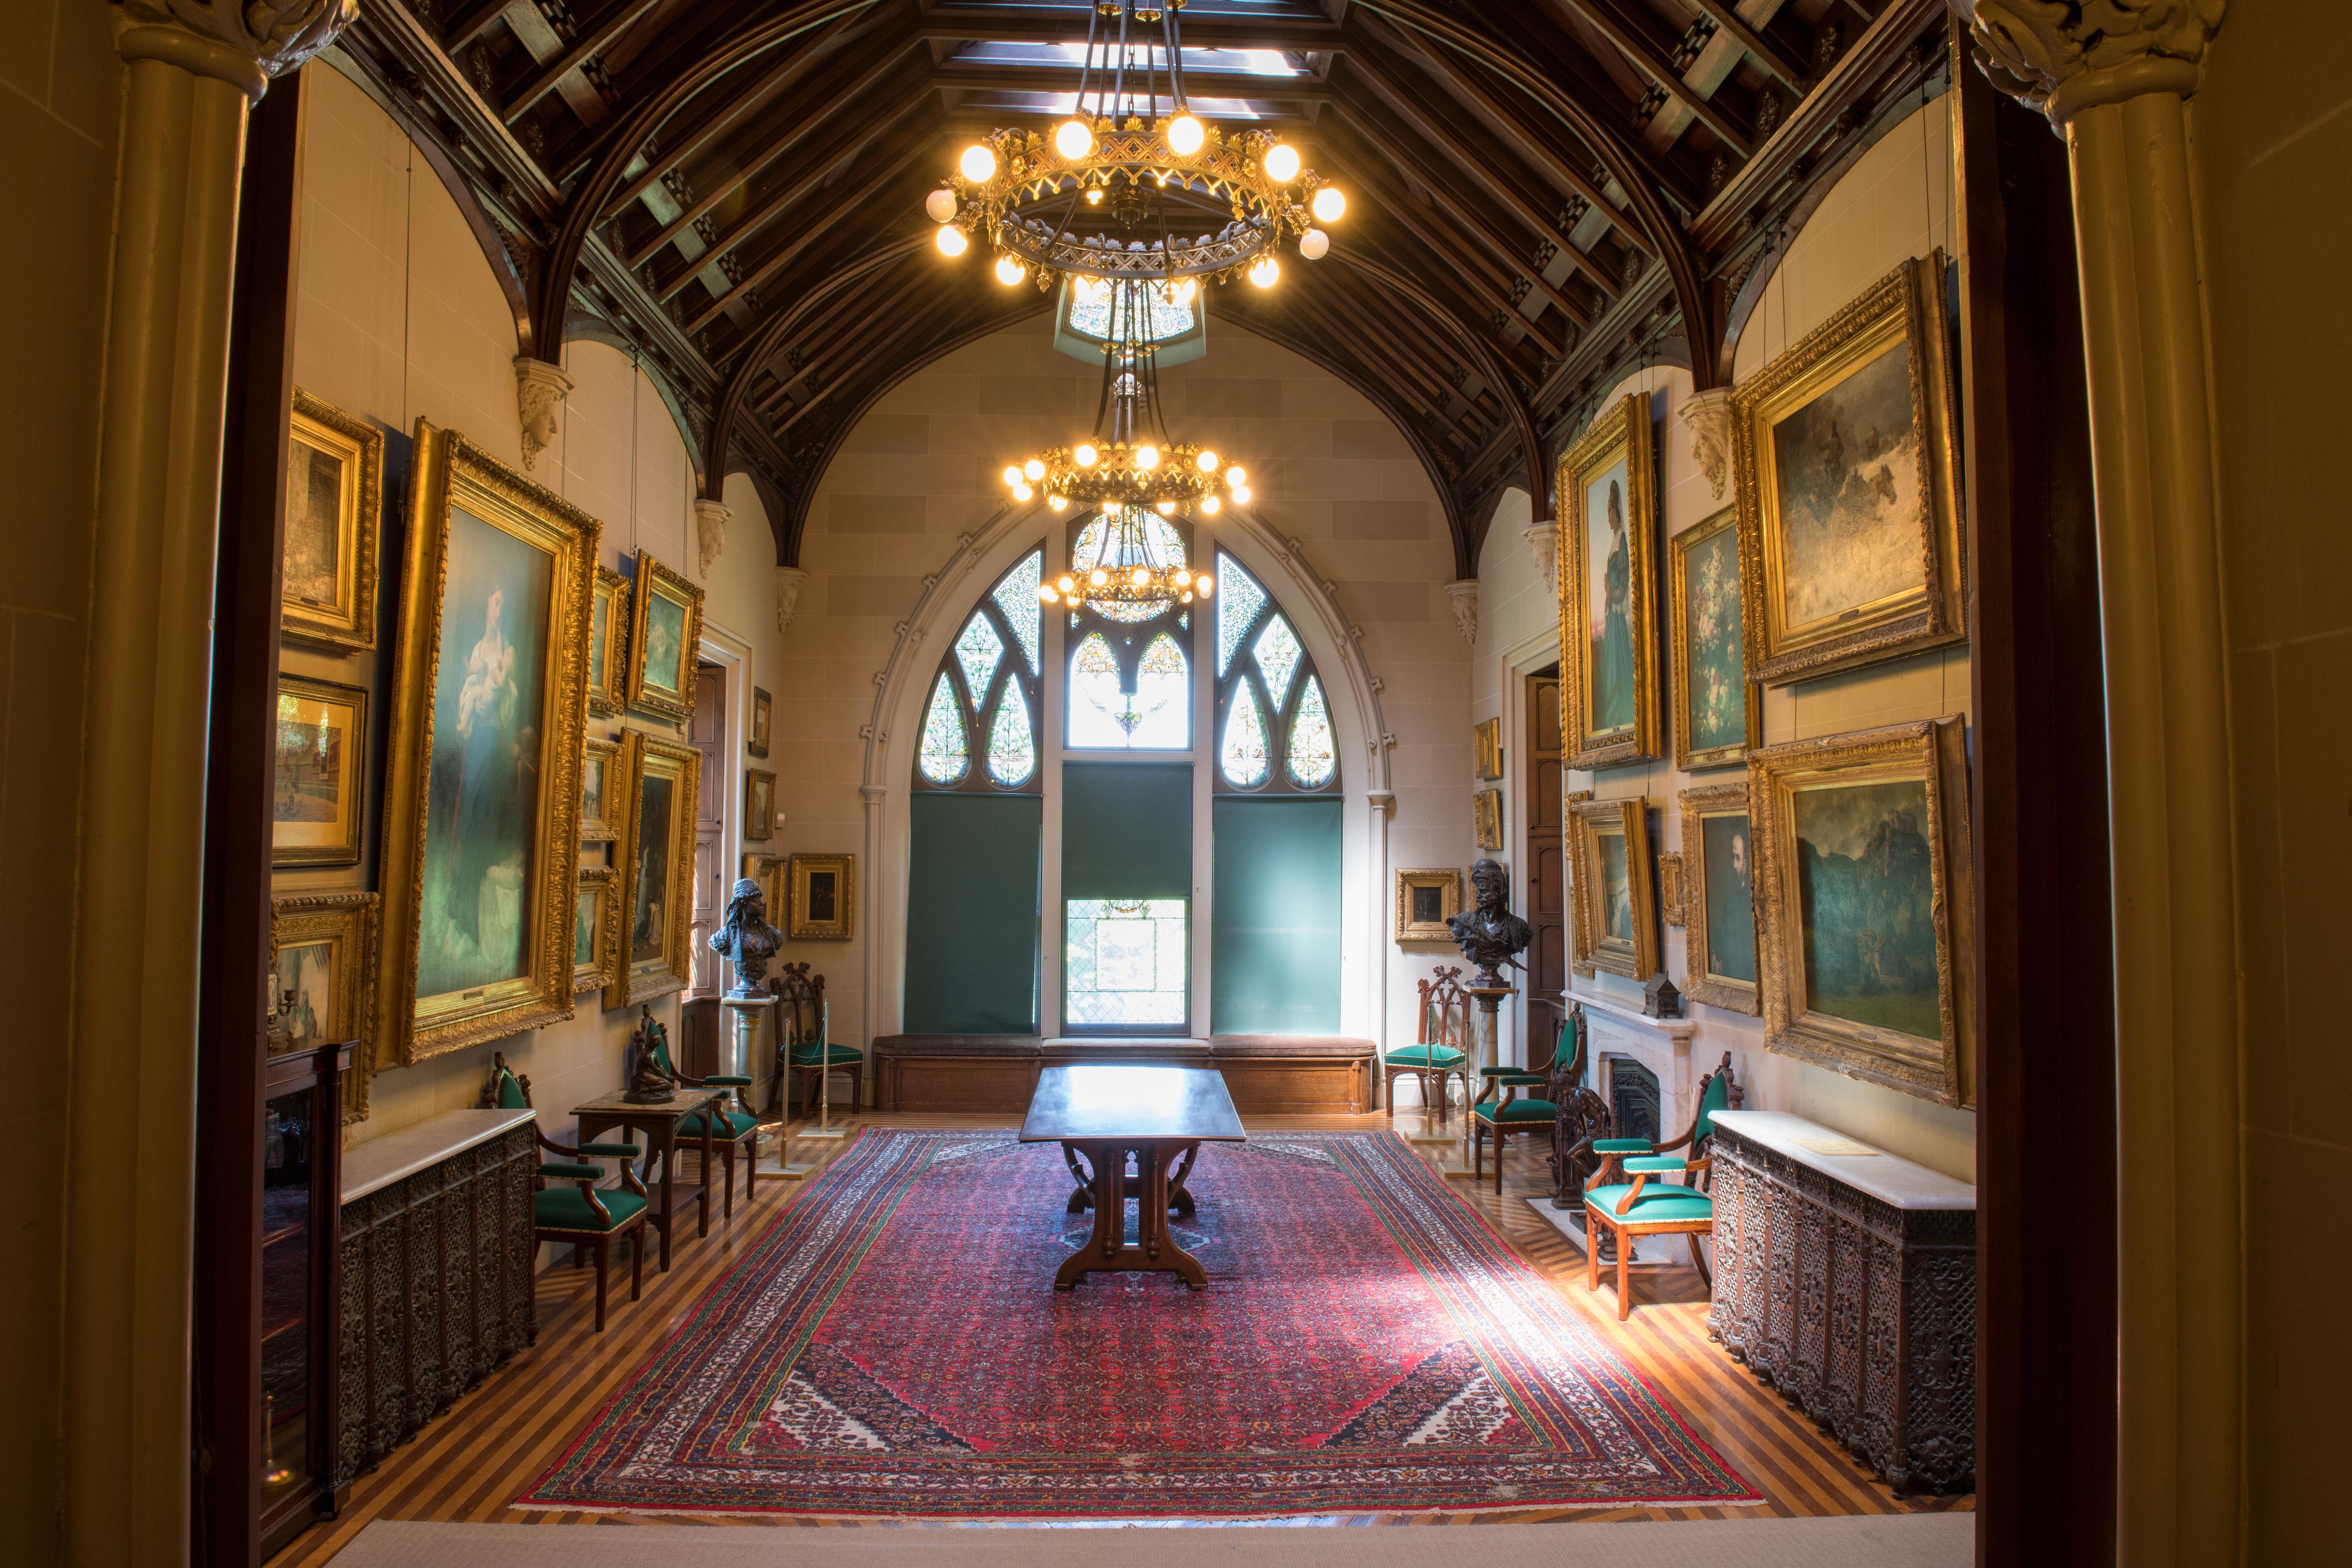 Lyndhurst Mansion Tarrytown Ny 10591 6499 New York Path